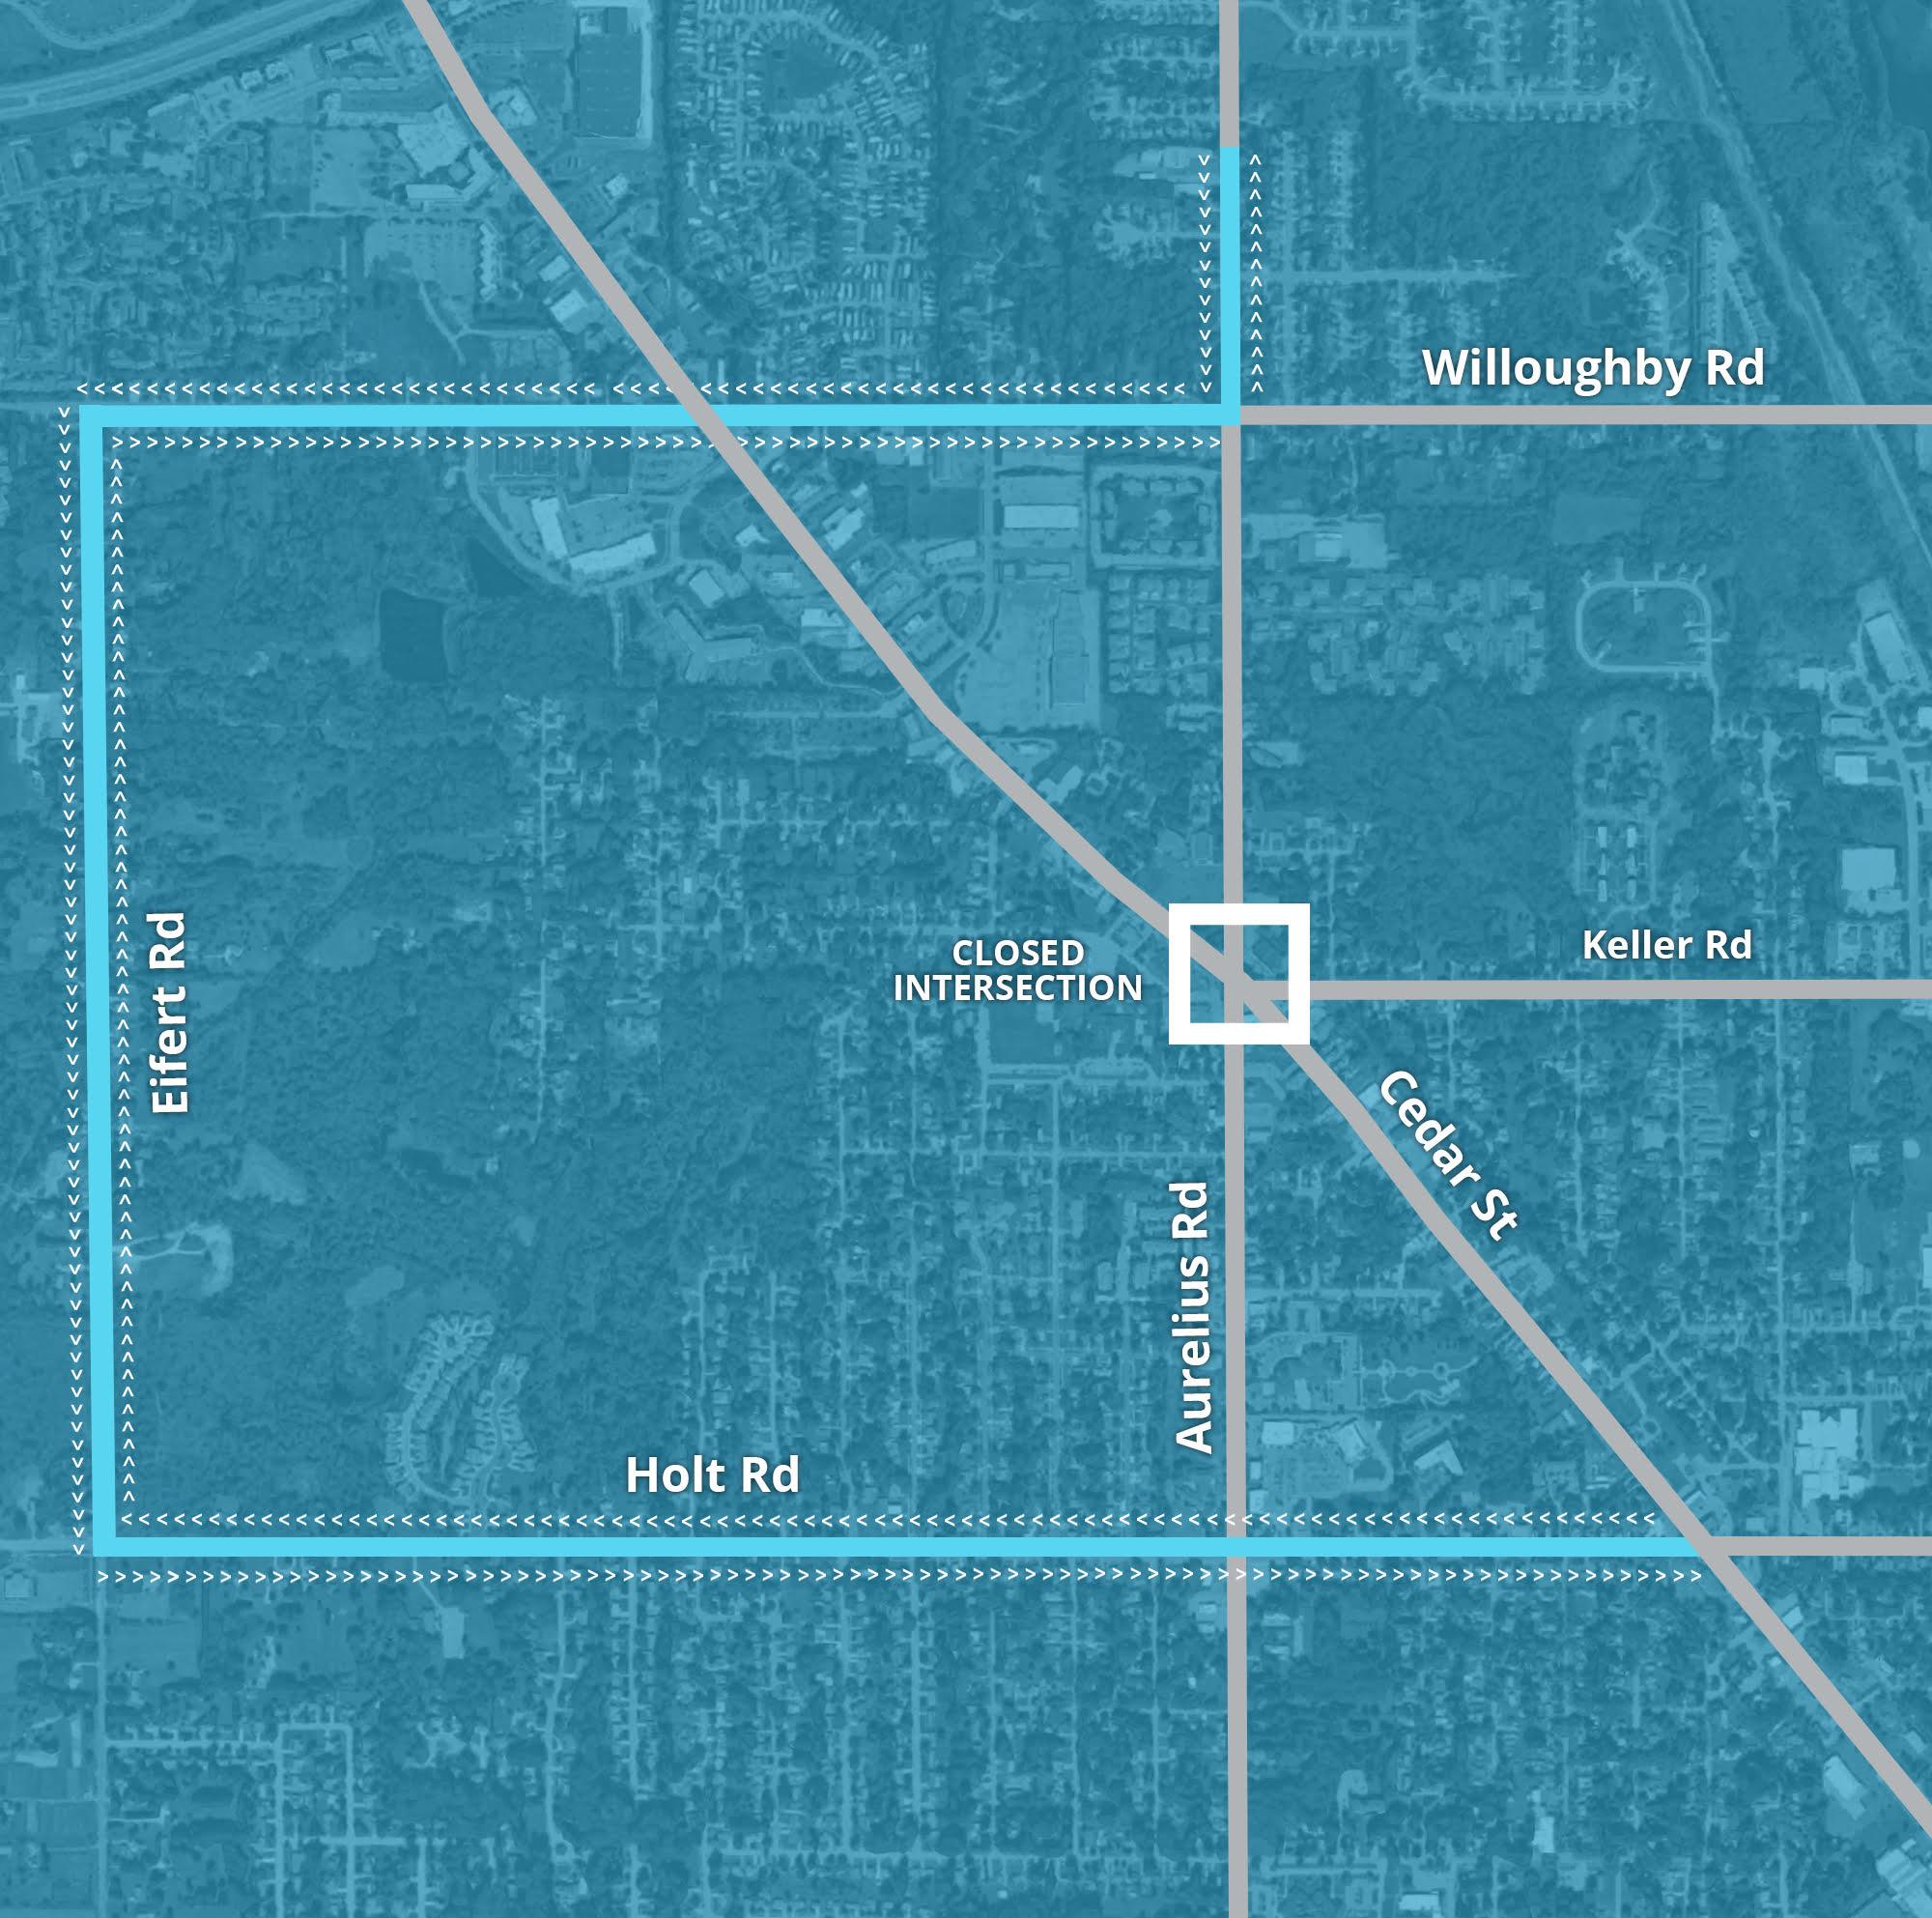 Aurelius_Cedar_Intersection_Closure_Map_10172018.jpg